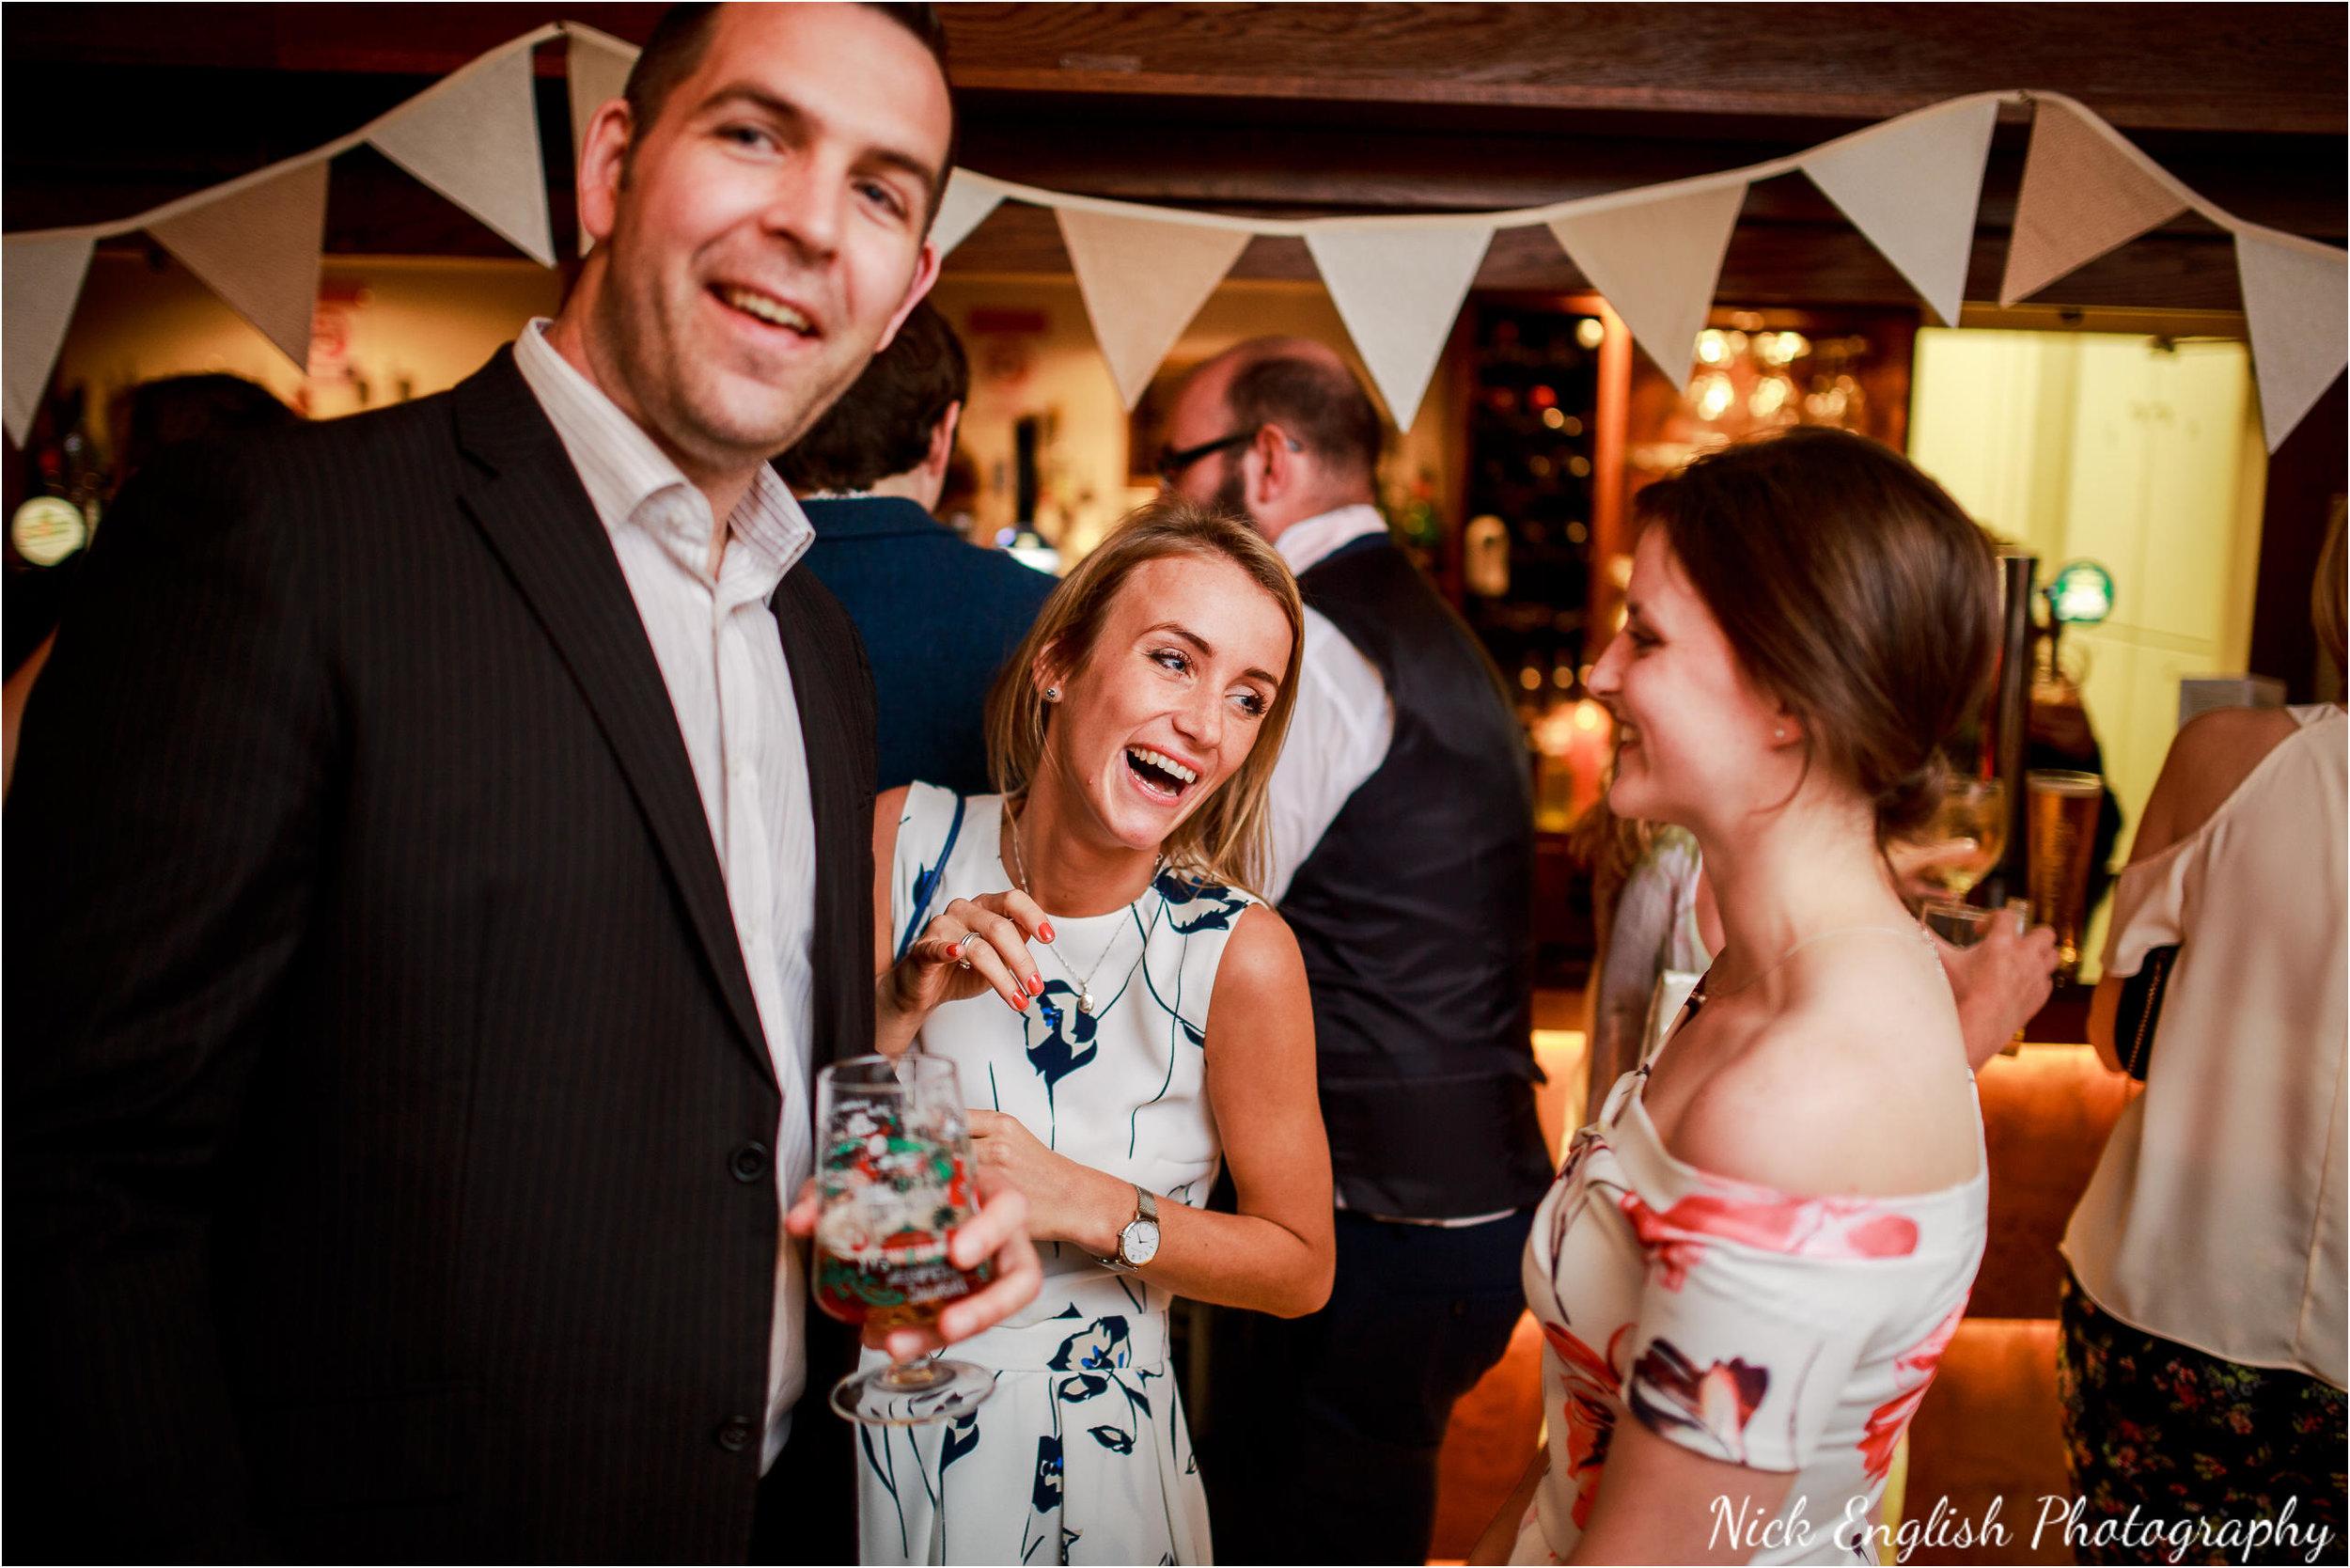 Emily David Wedding Photographs at Barton Grange Preston by Nick English Photography 207jpg.jpeg